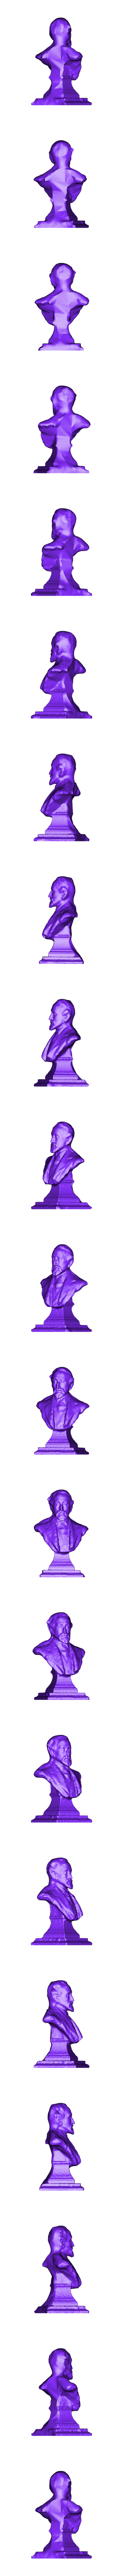 GE_Finch_-_Oakham_Castle.stl Download free OBJ file G.H. Finch MP (Oakham Castle) • 3D printer design, tone001